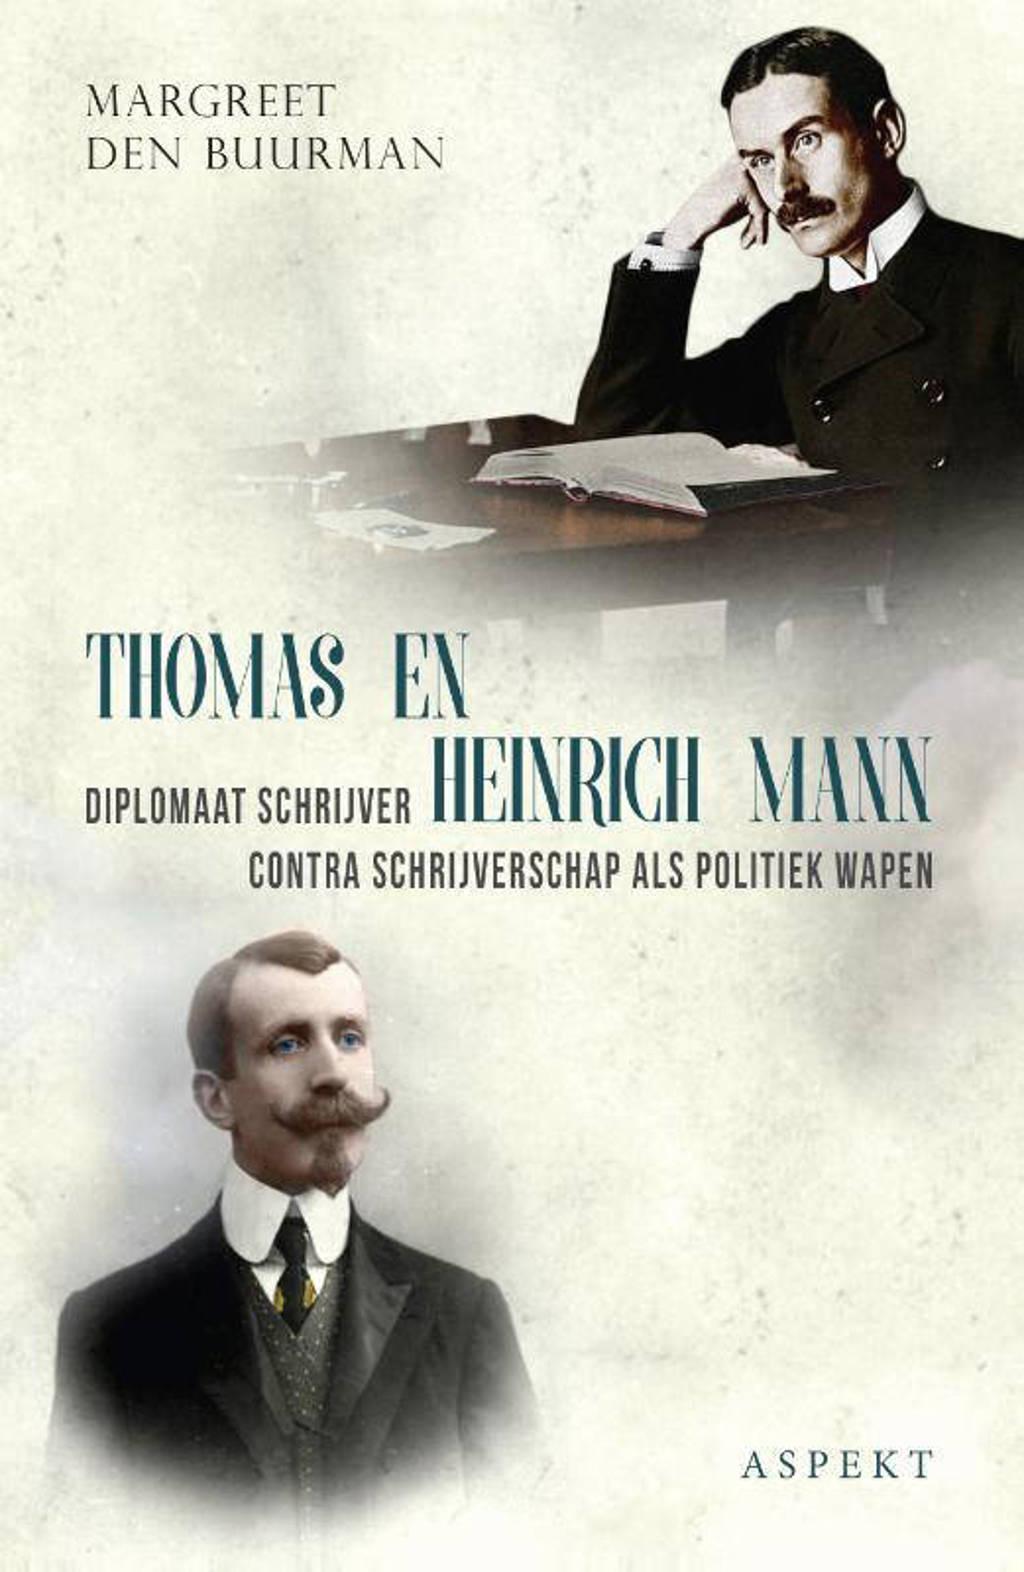 Thomas en Heinrich Mann - Margreet den Buurman